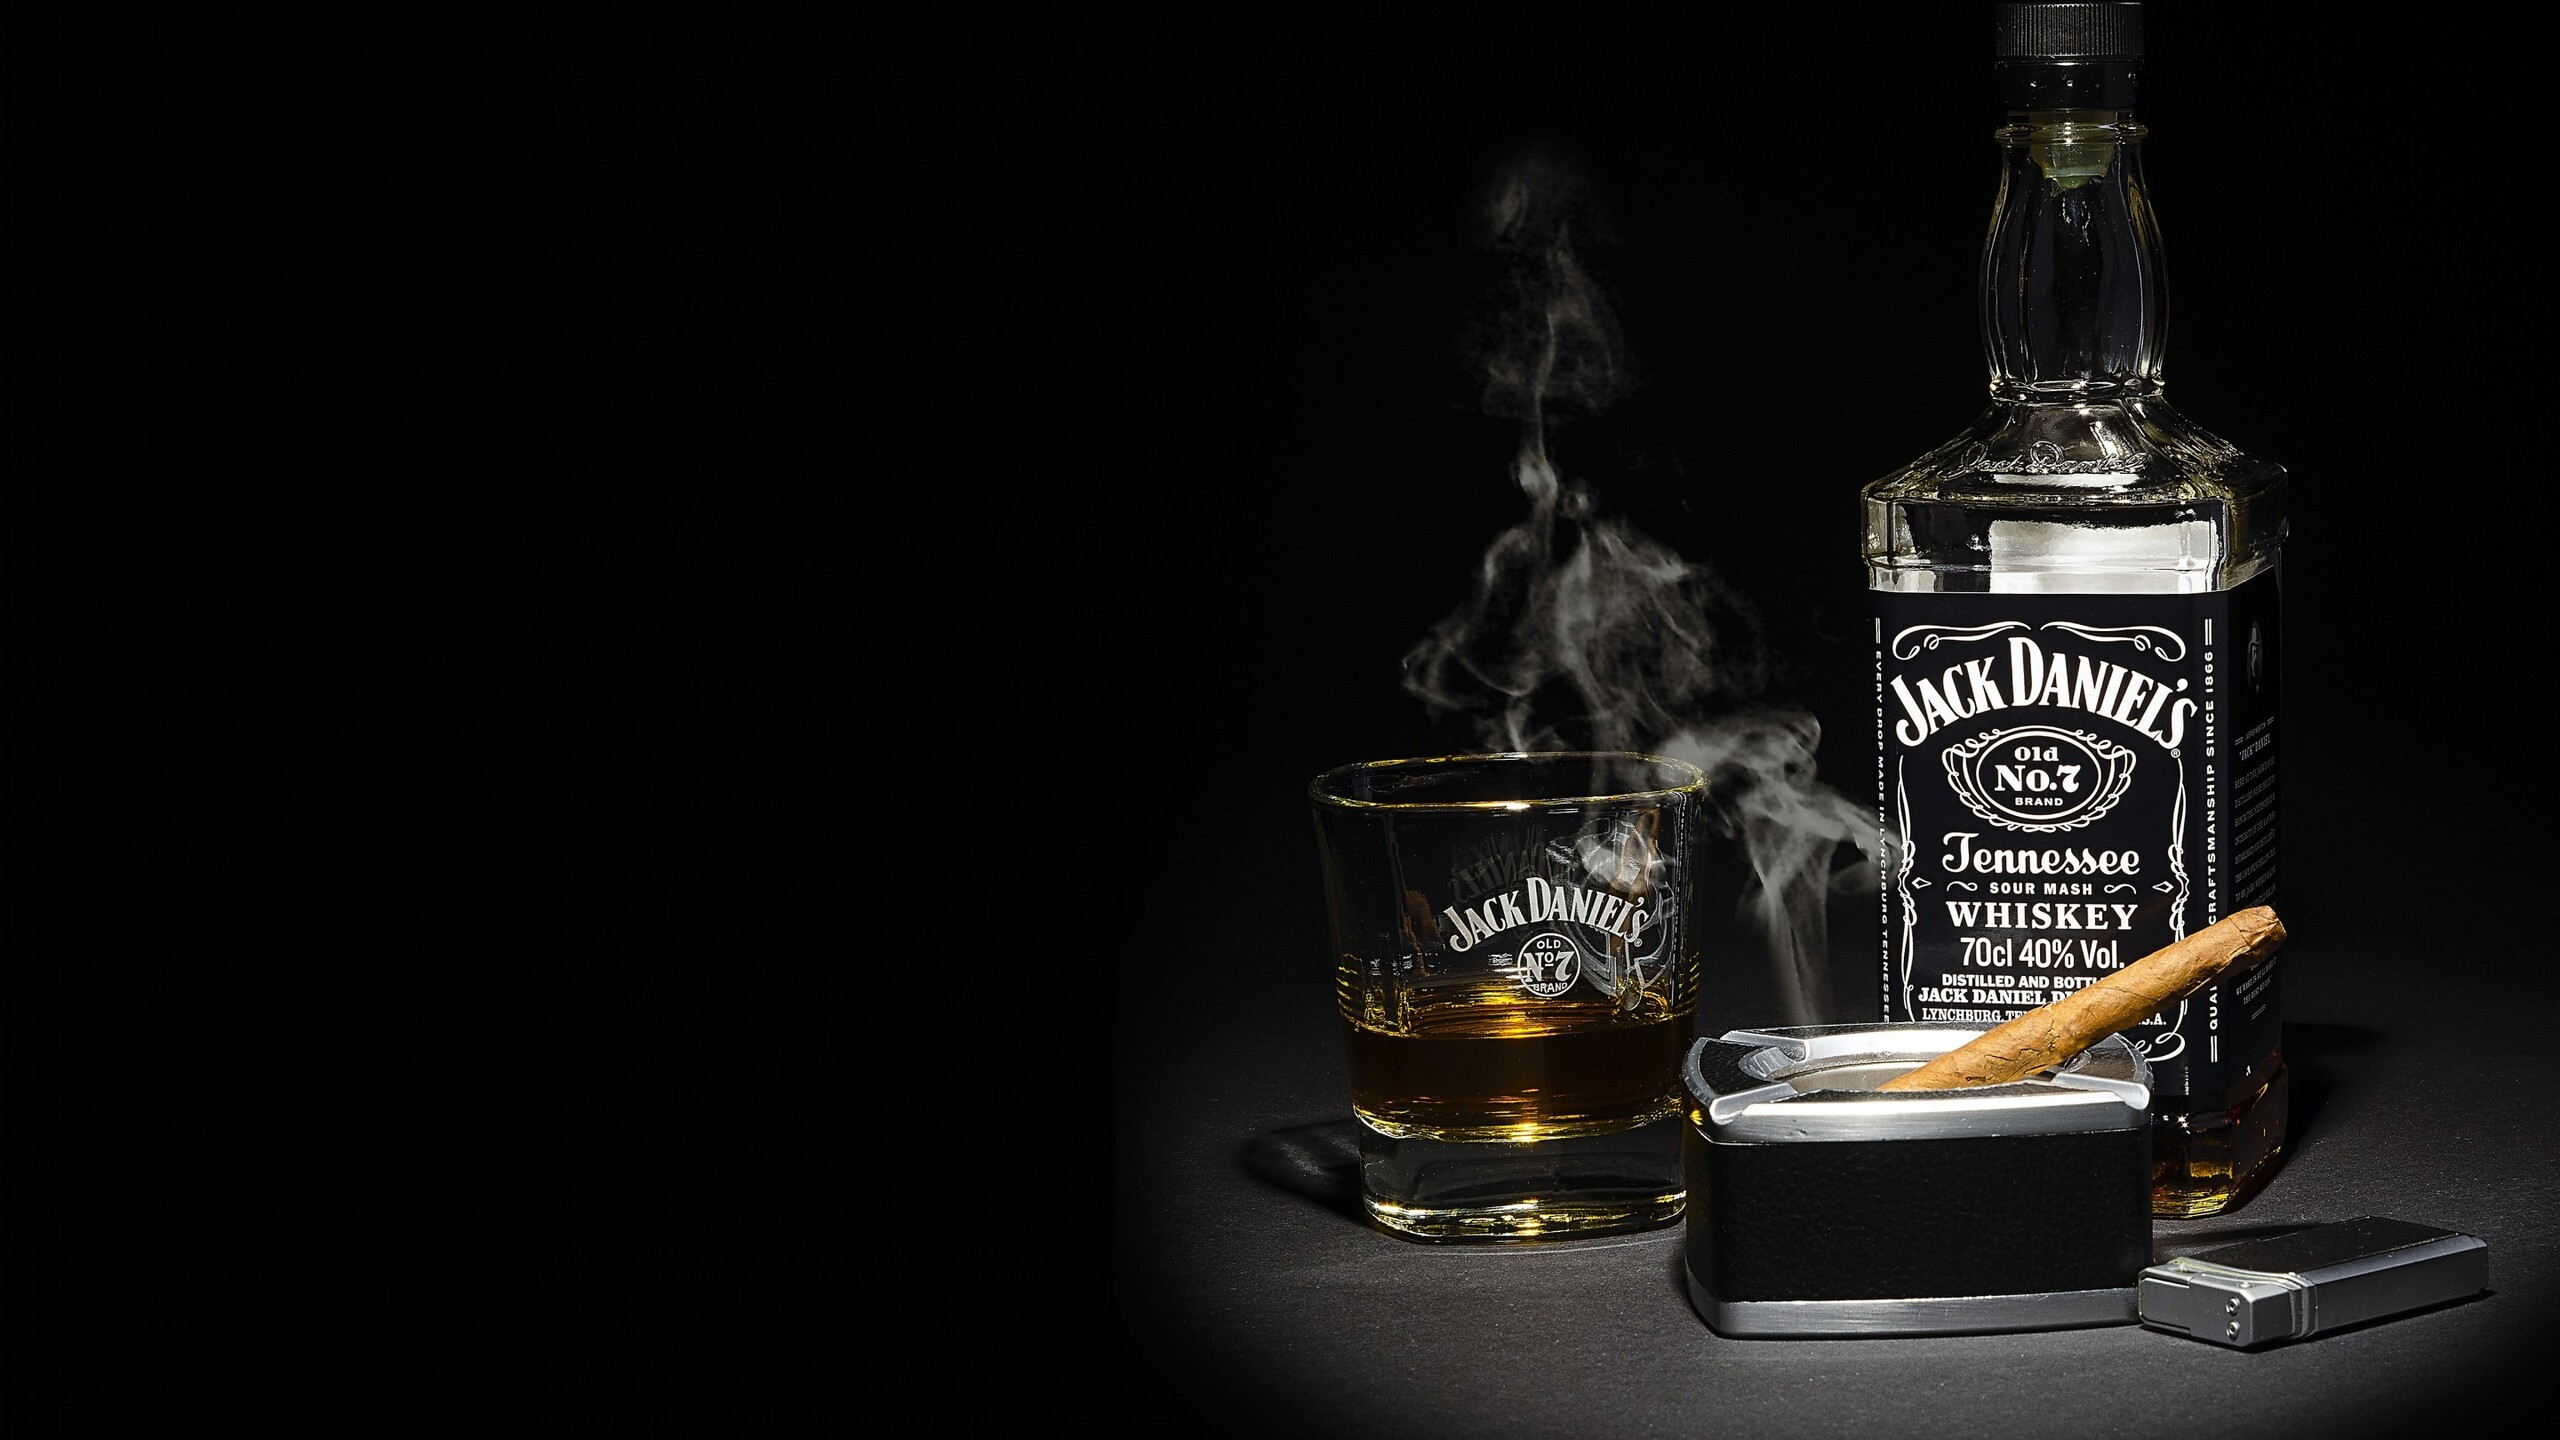 2560x1440 Jack Daniels Whiskey 1440P Resolution HD 4k ...